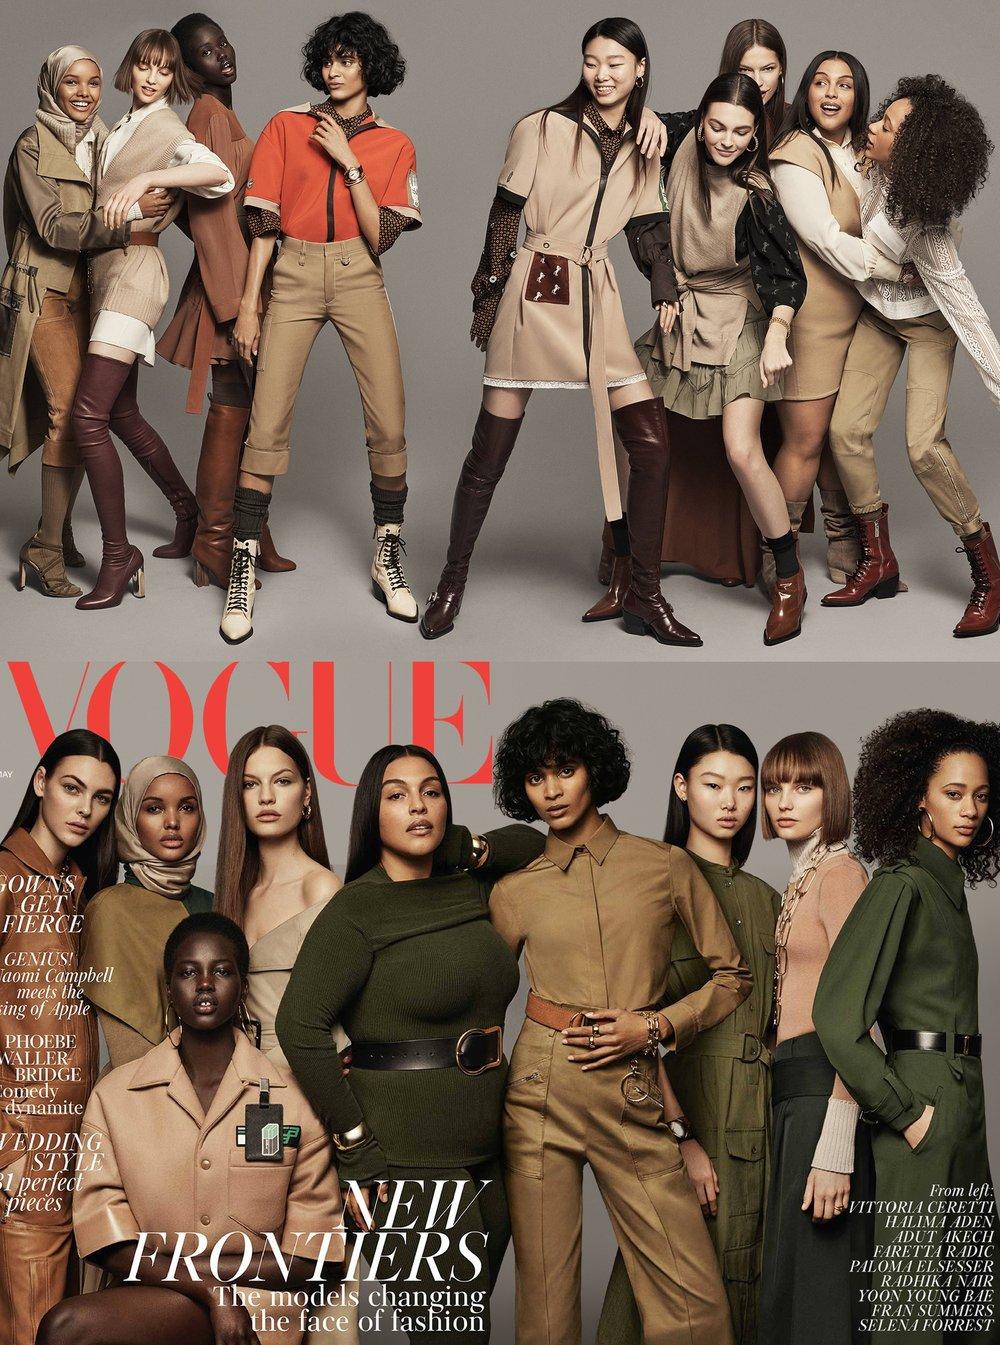 vogue-uk-cover-may-2018-.jpg